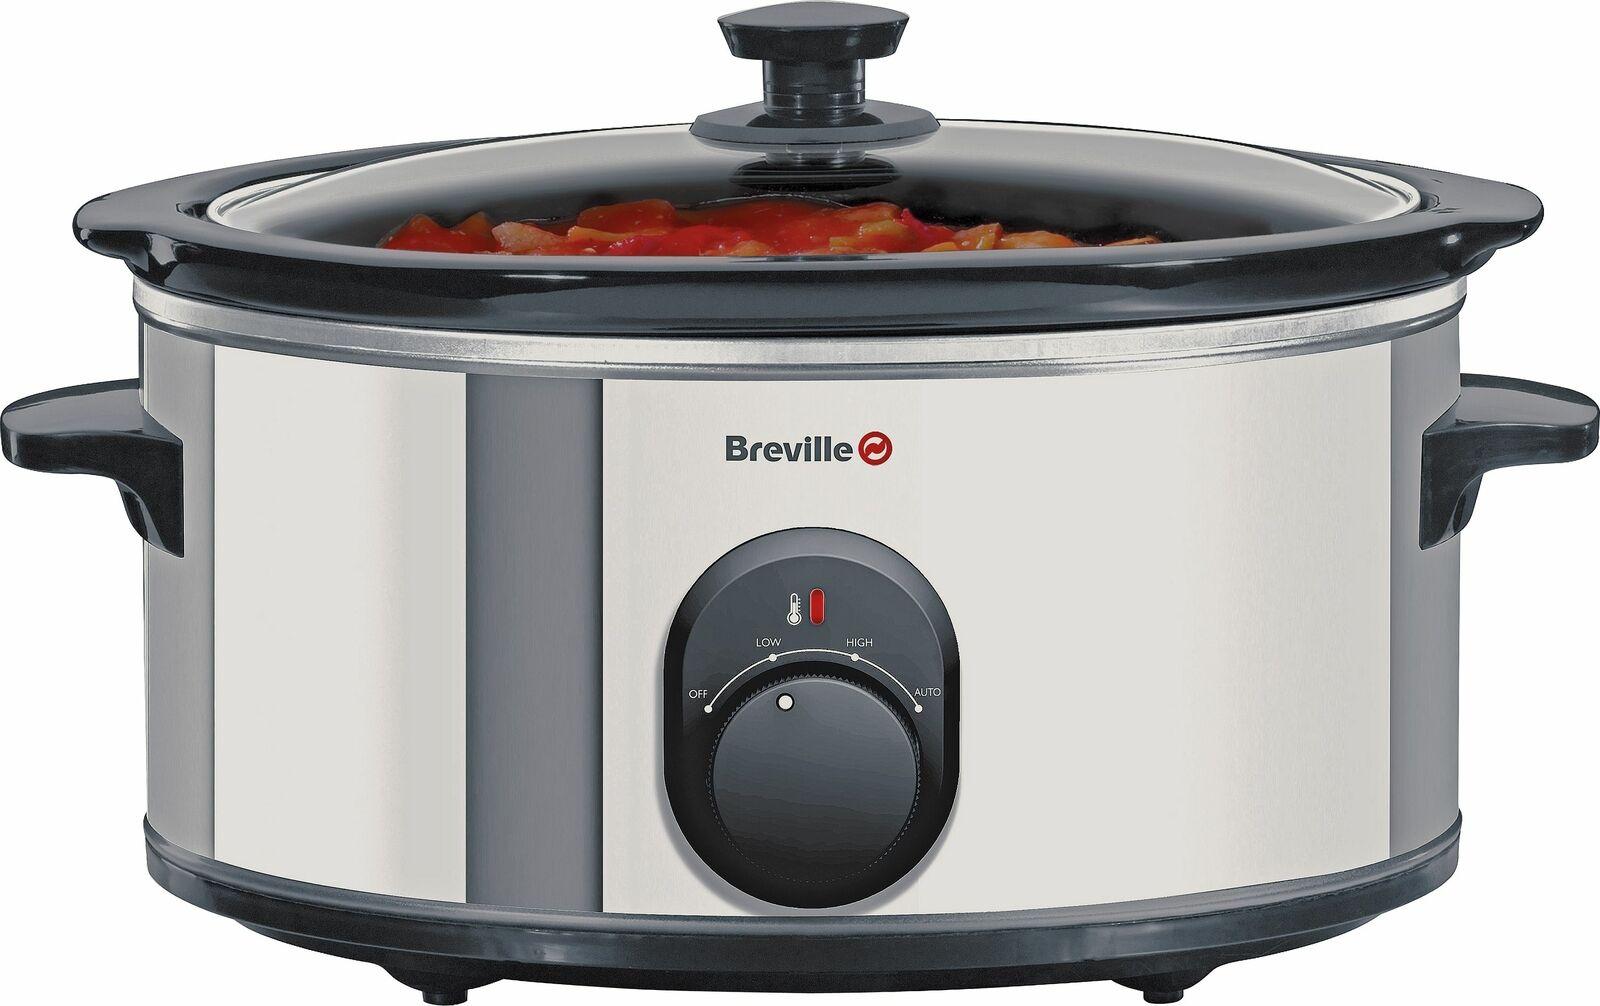 Breville ITP137 4.5L 3 Settings Ceramic Bowl Slow Cooker - Stainless Steel 265W - £12.99 @ Argos / Ebay